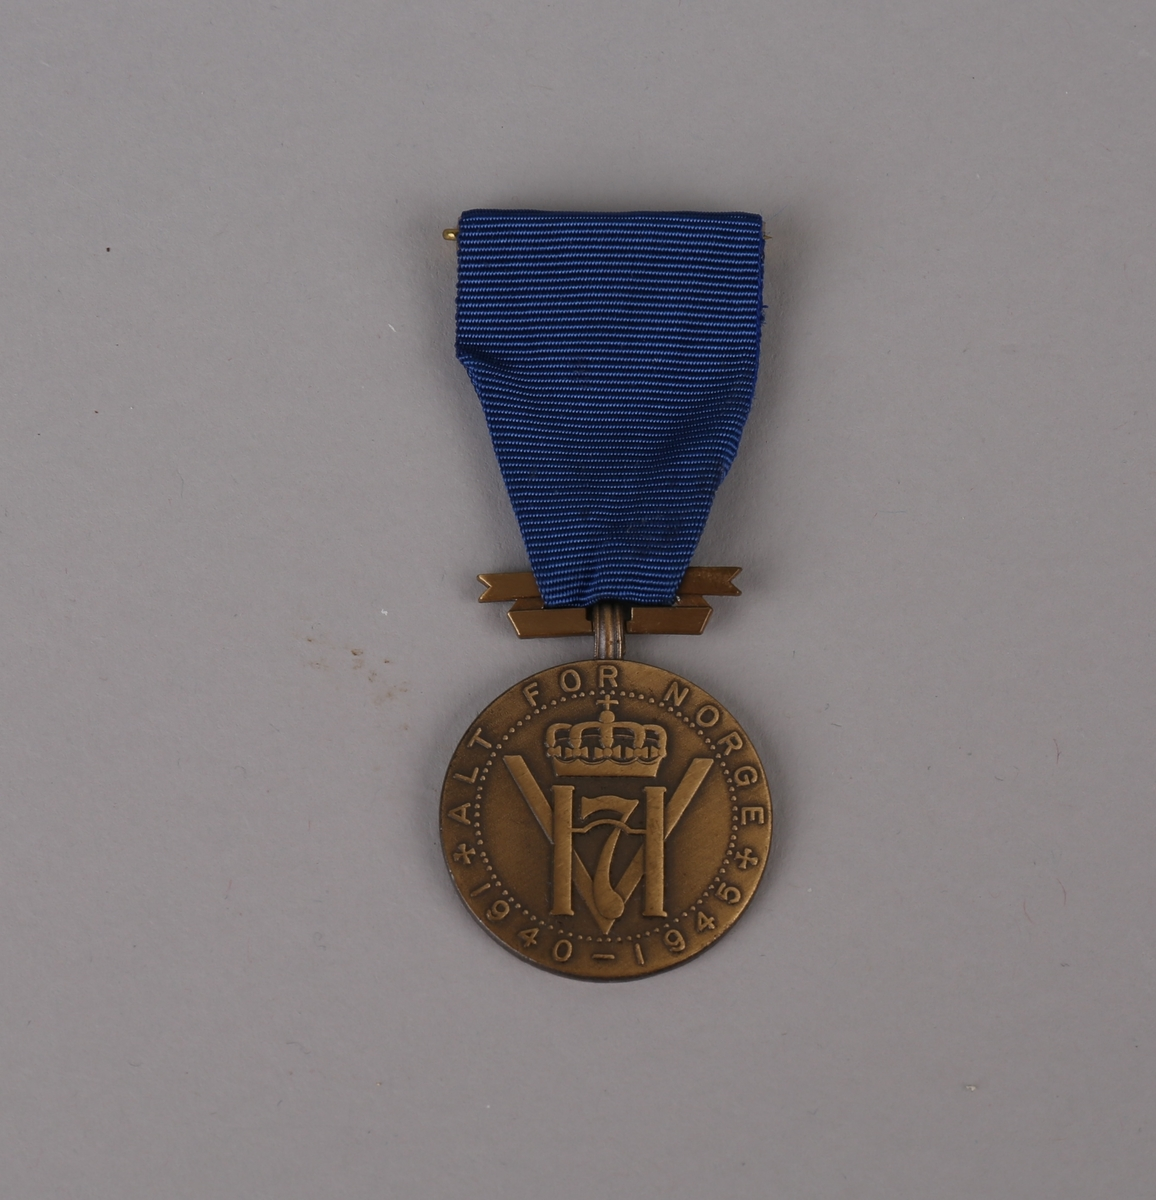 "Bronsemedalje ""Alt for Norge 1940-1945"" med Haakon 7. monogram med tekst på forsiden samt kransdekor på baksiden."